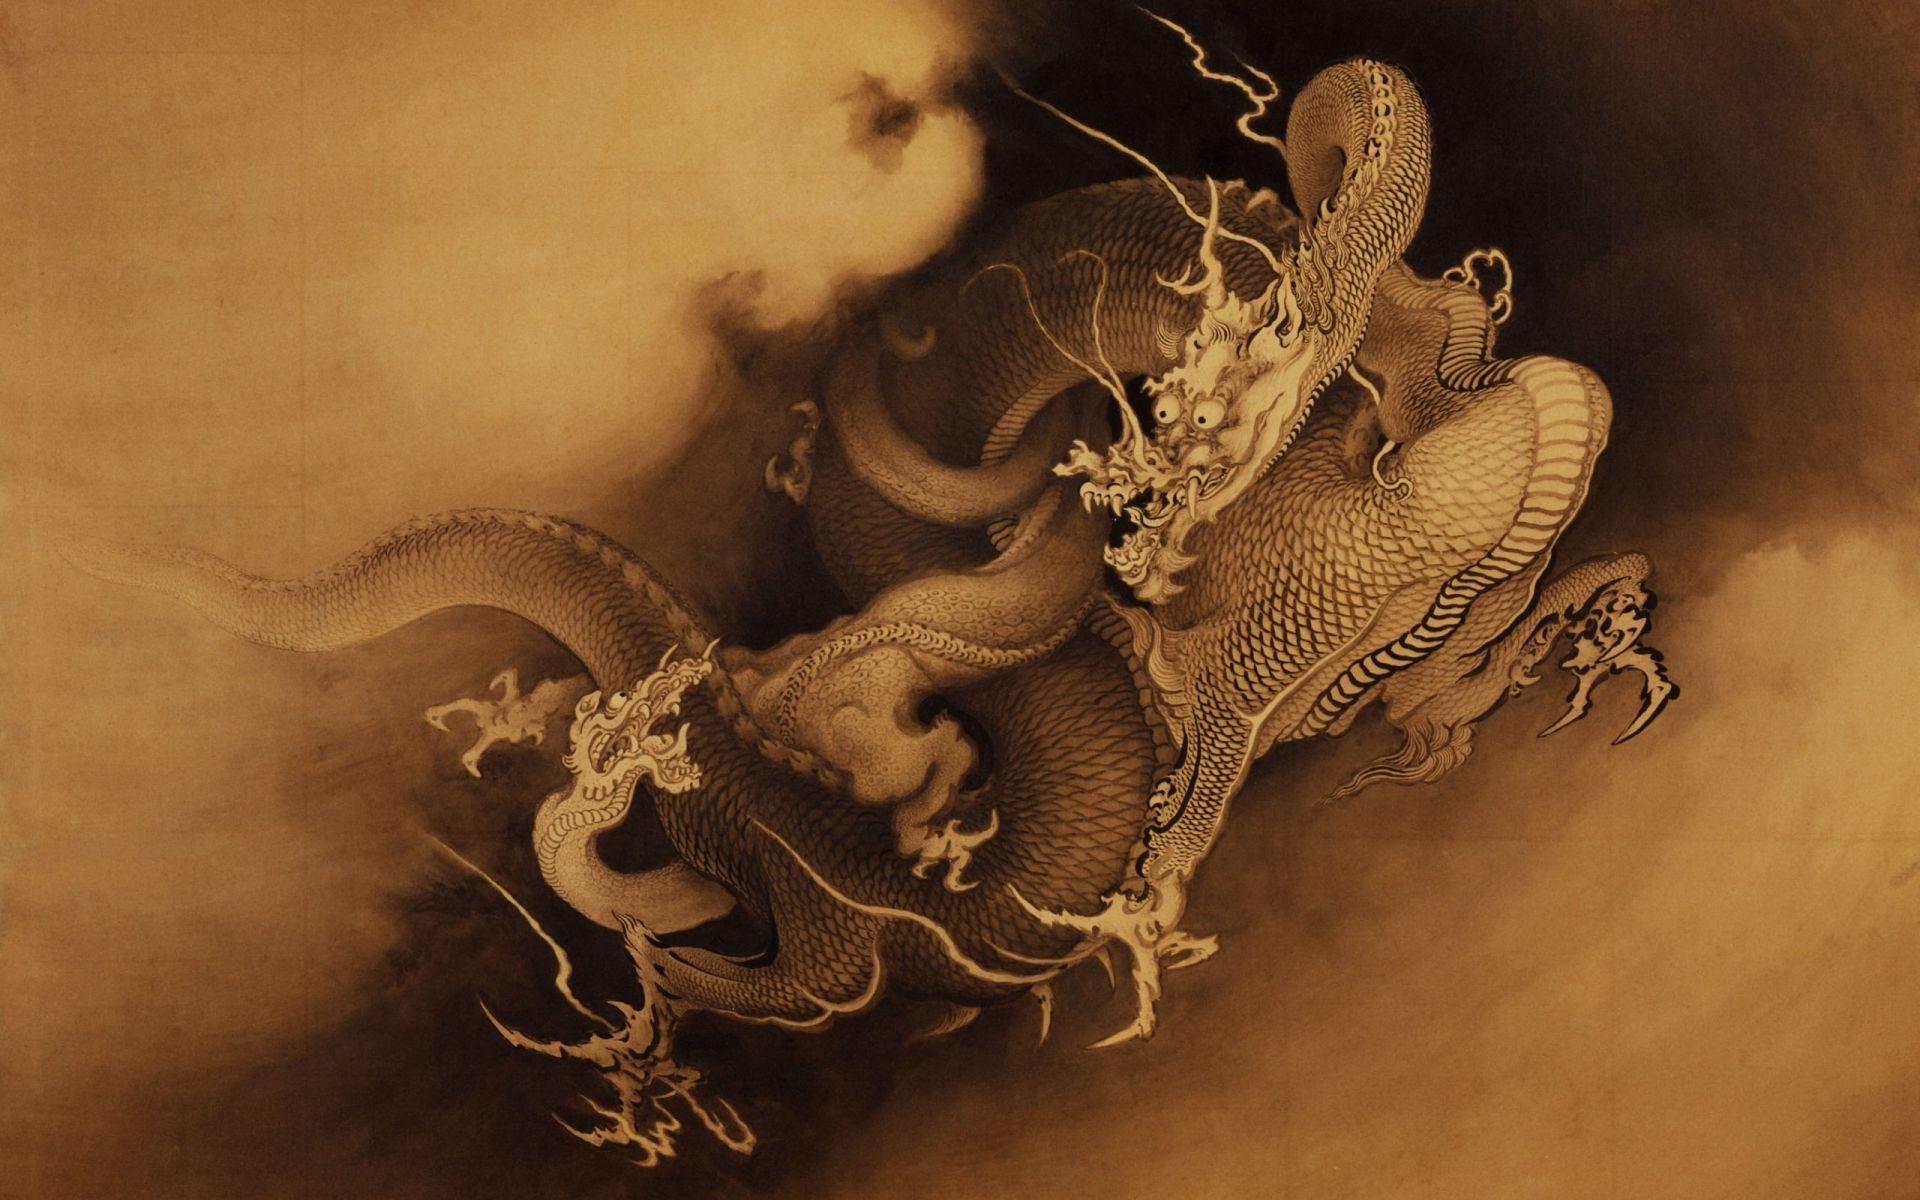 the dragon picture